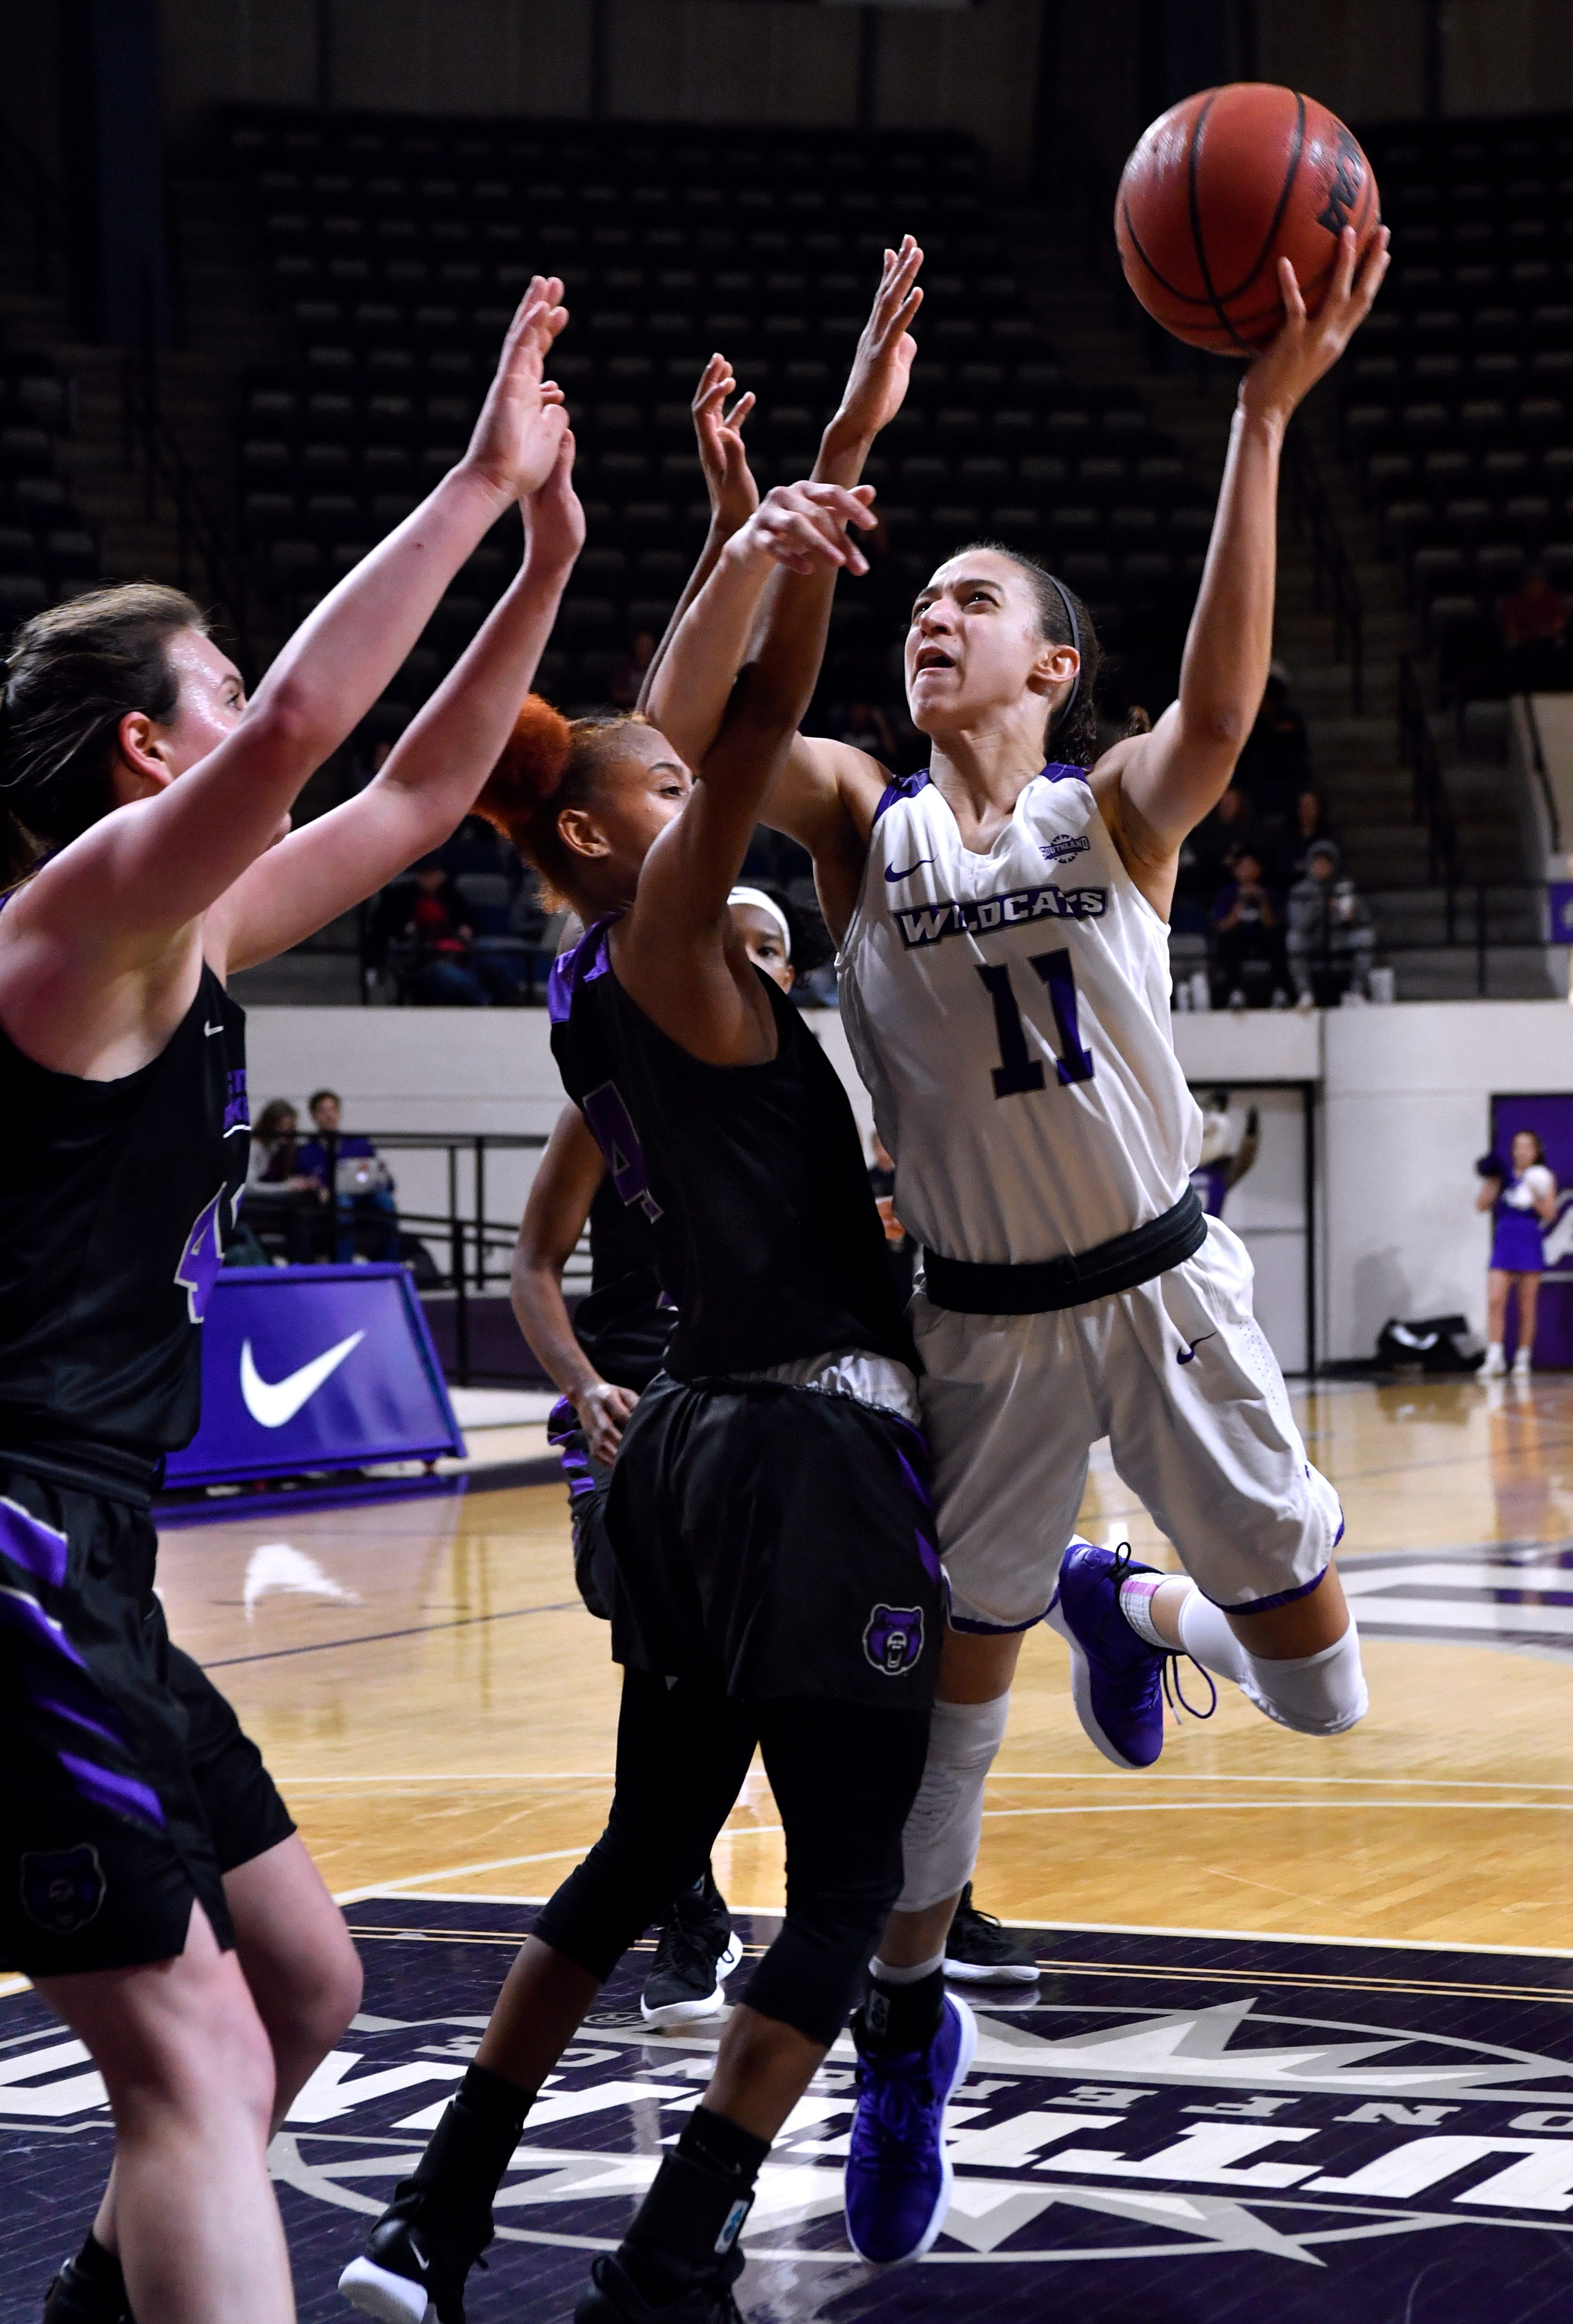 Sara Williamson goes for the basket during Abilene Christian University's women's basketball game against Central Arkansas Saturday Jan. 26, 2019. Final score was 77-70, ACU.